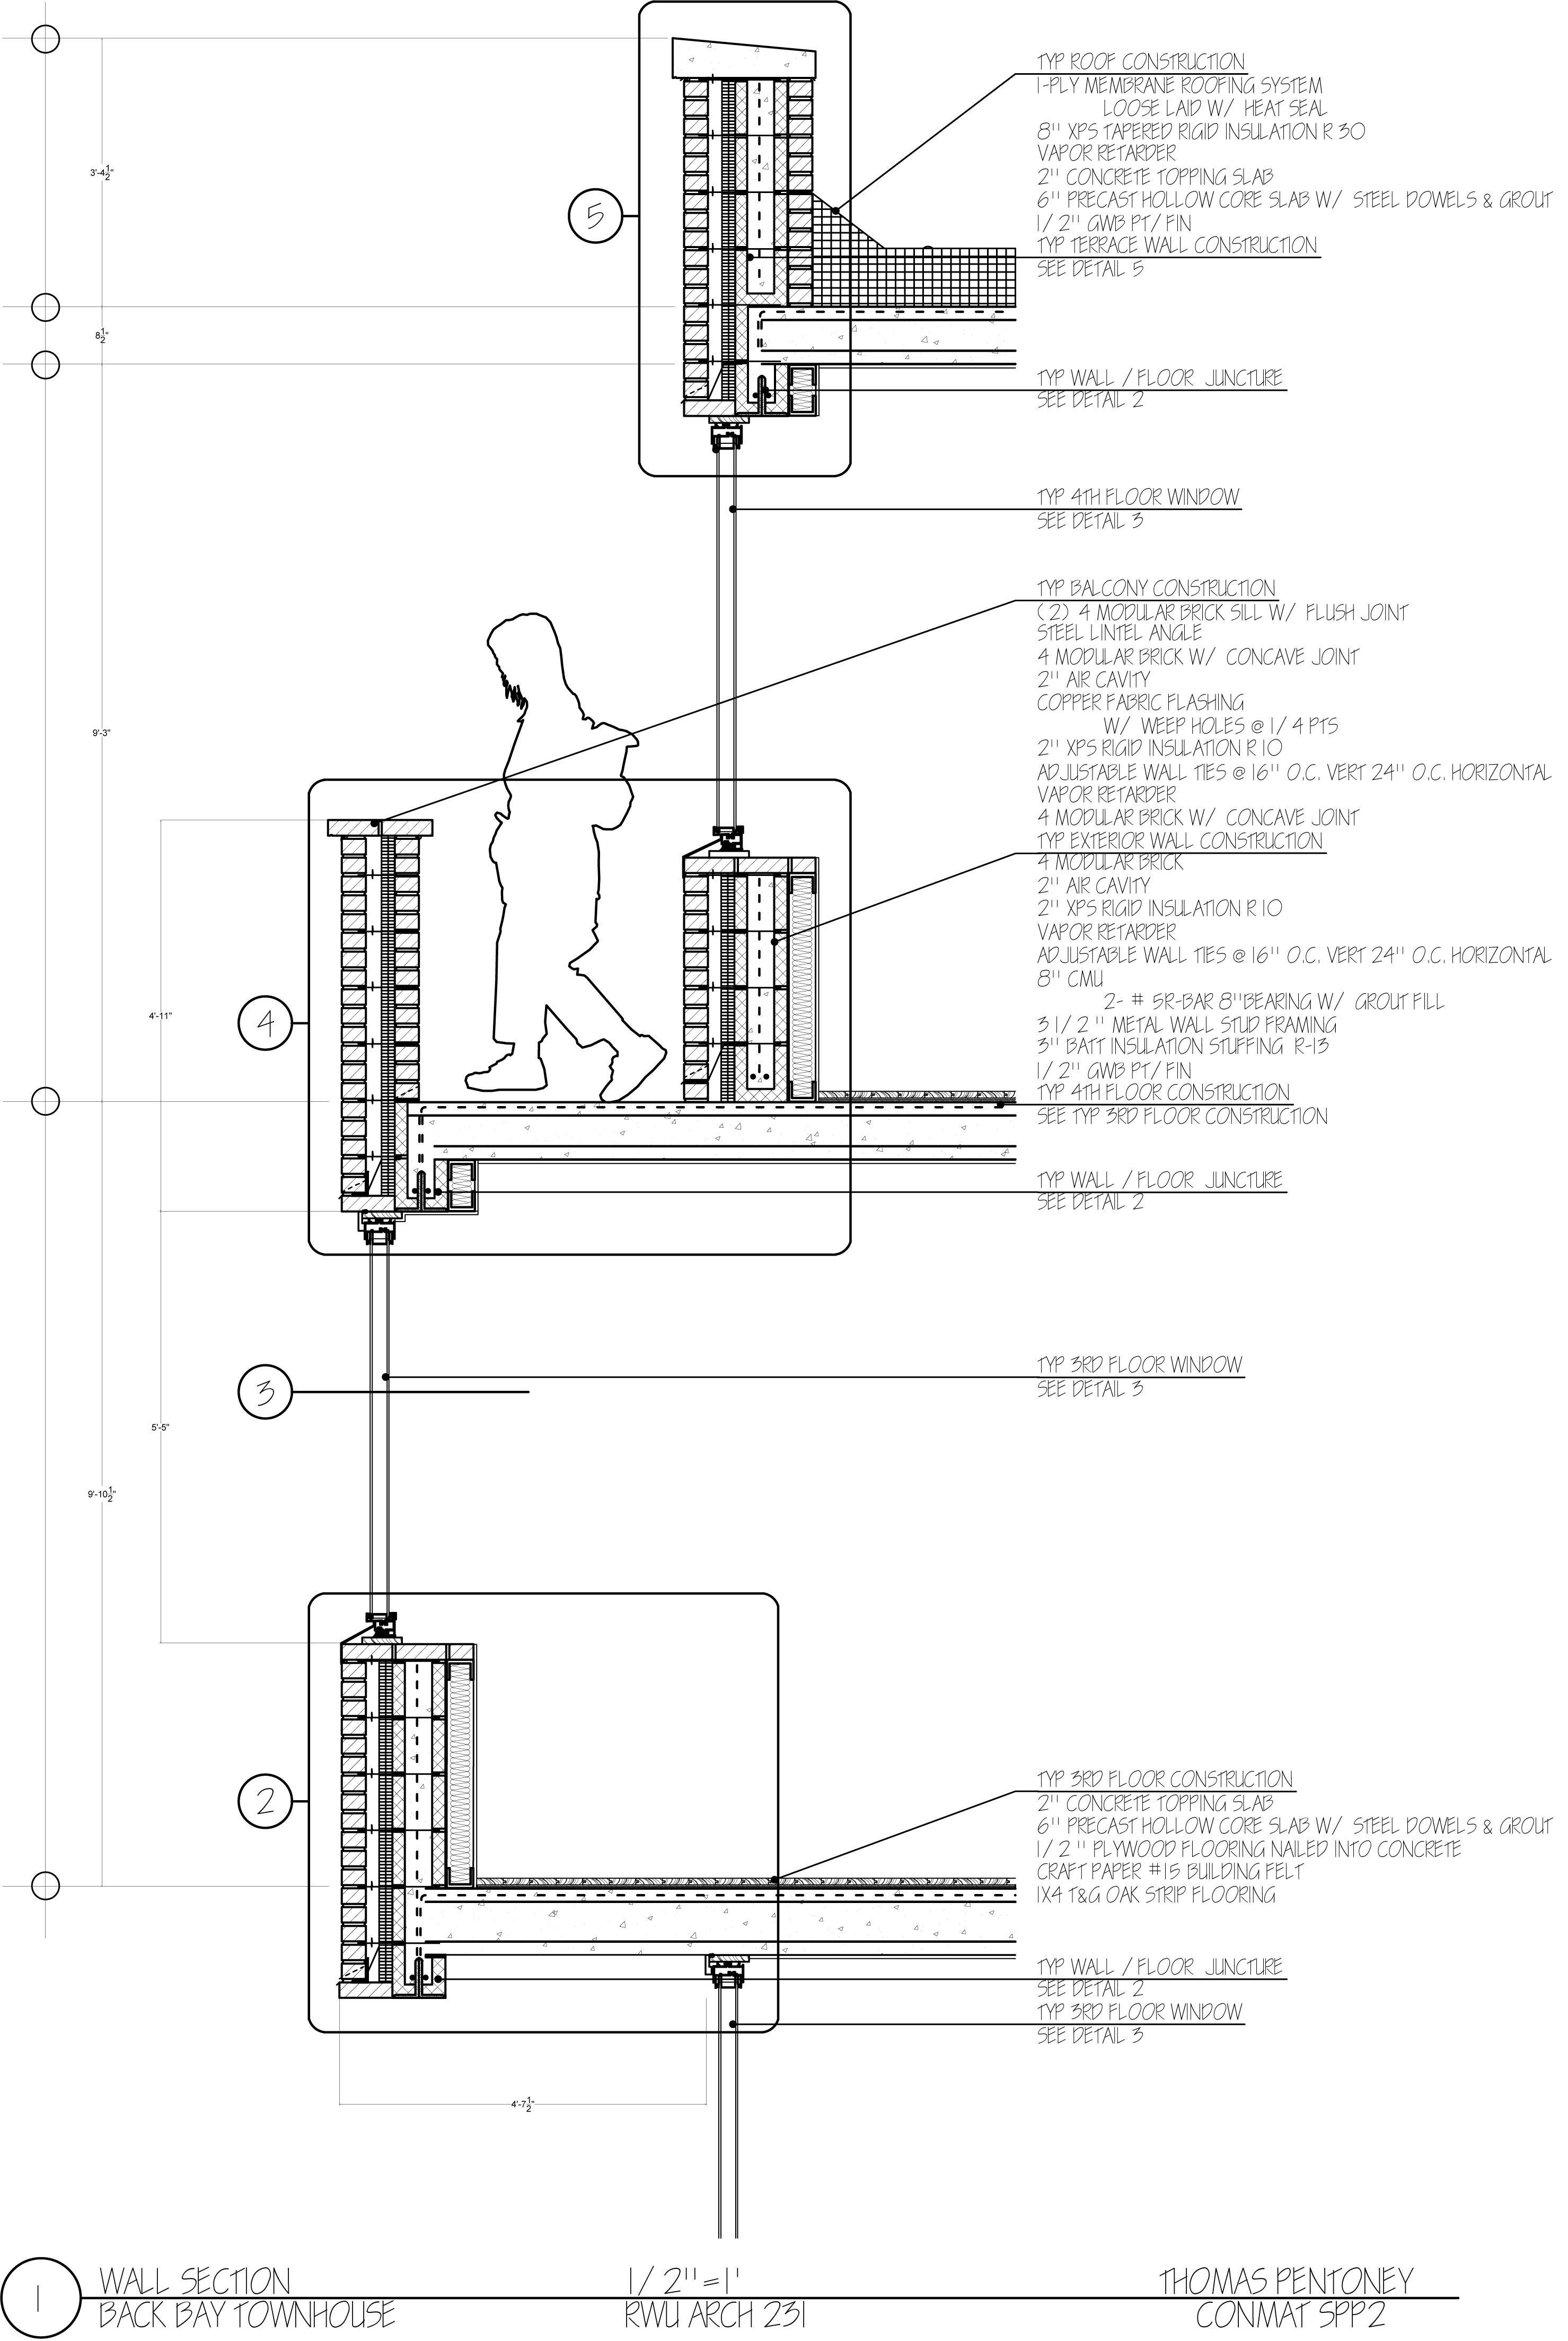 Pin By Elizabeth Daniels On Detailing In 2019 Interior